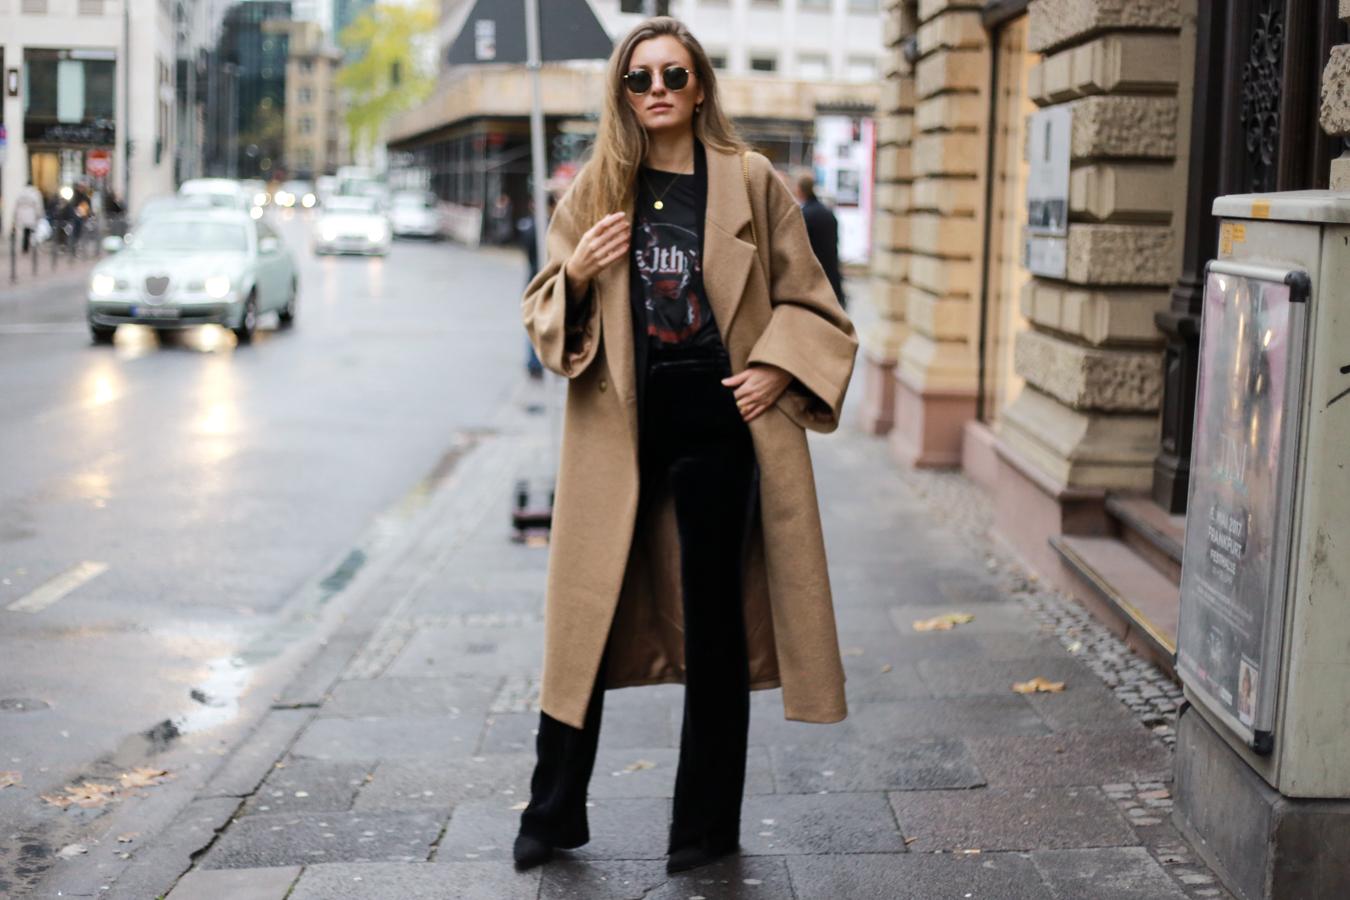 velvet-band-shirt-camel-coat-outfit-livia-auer-6575